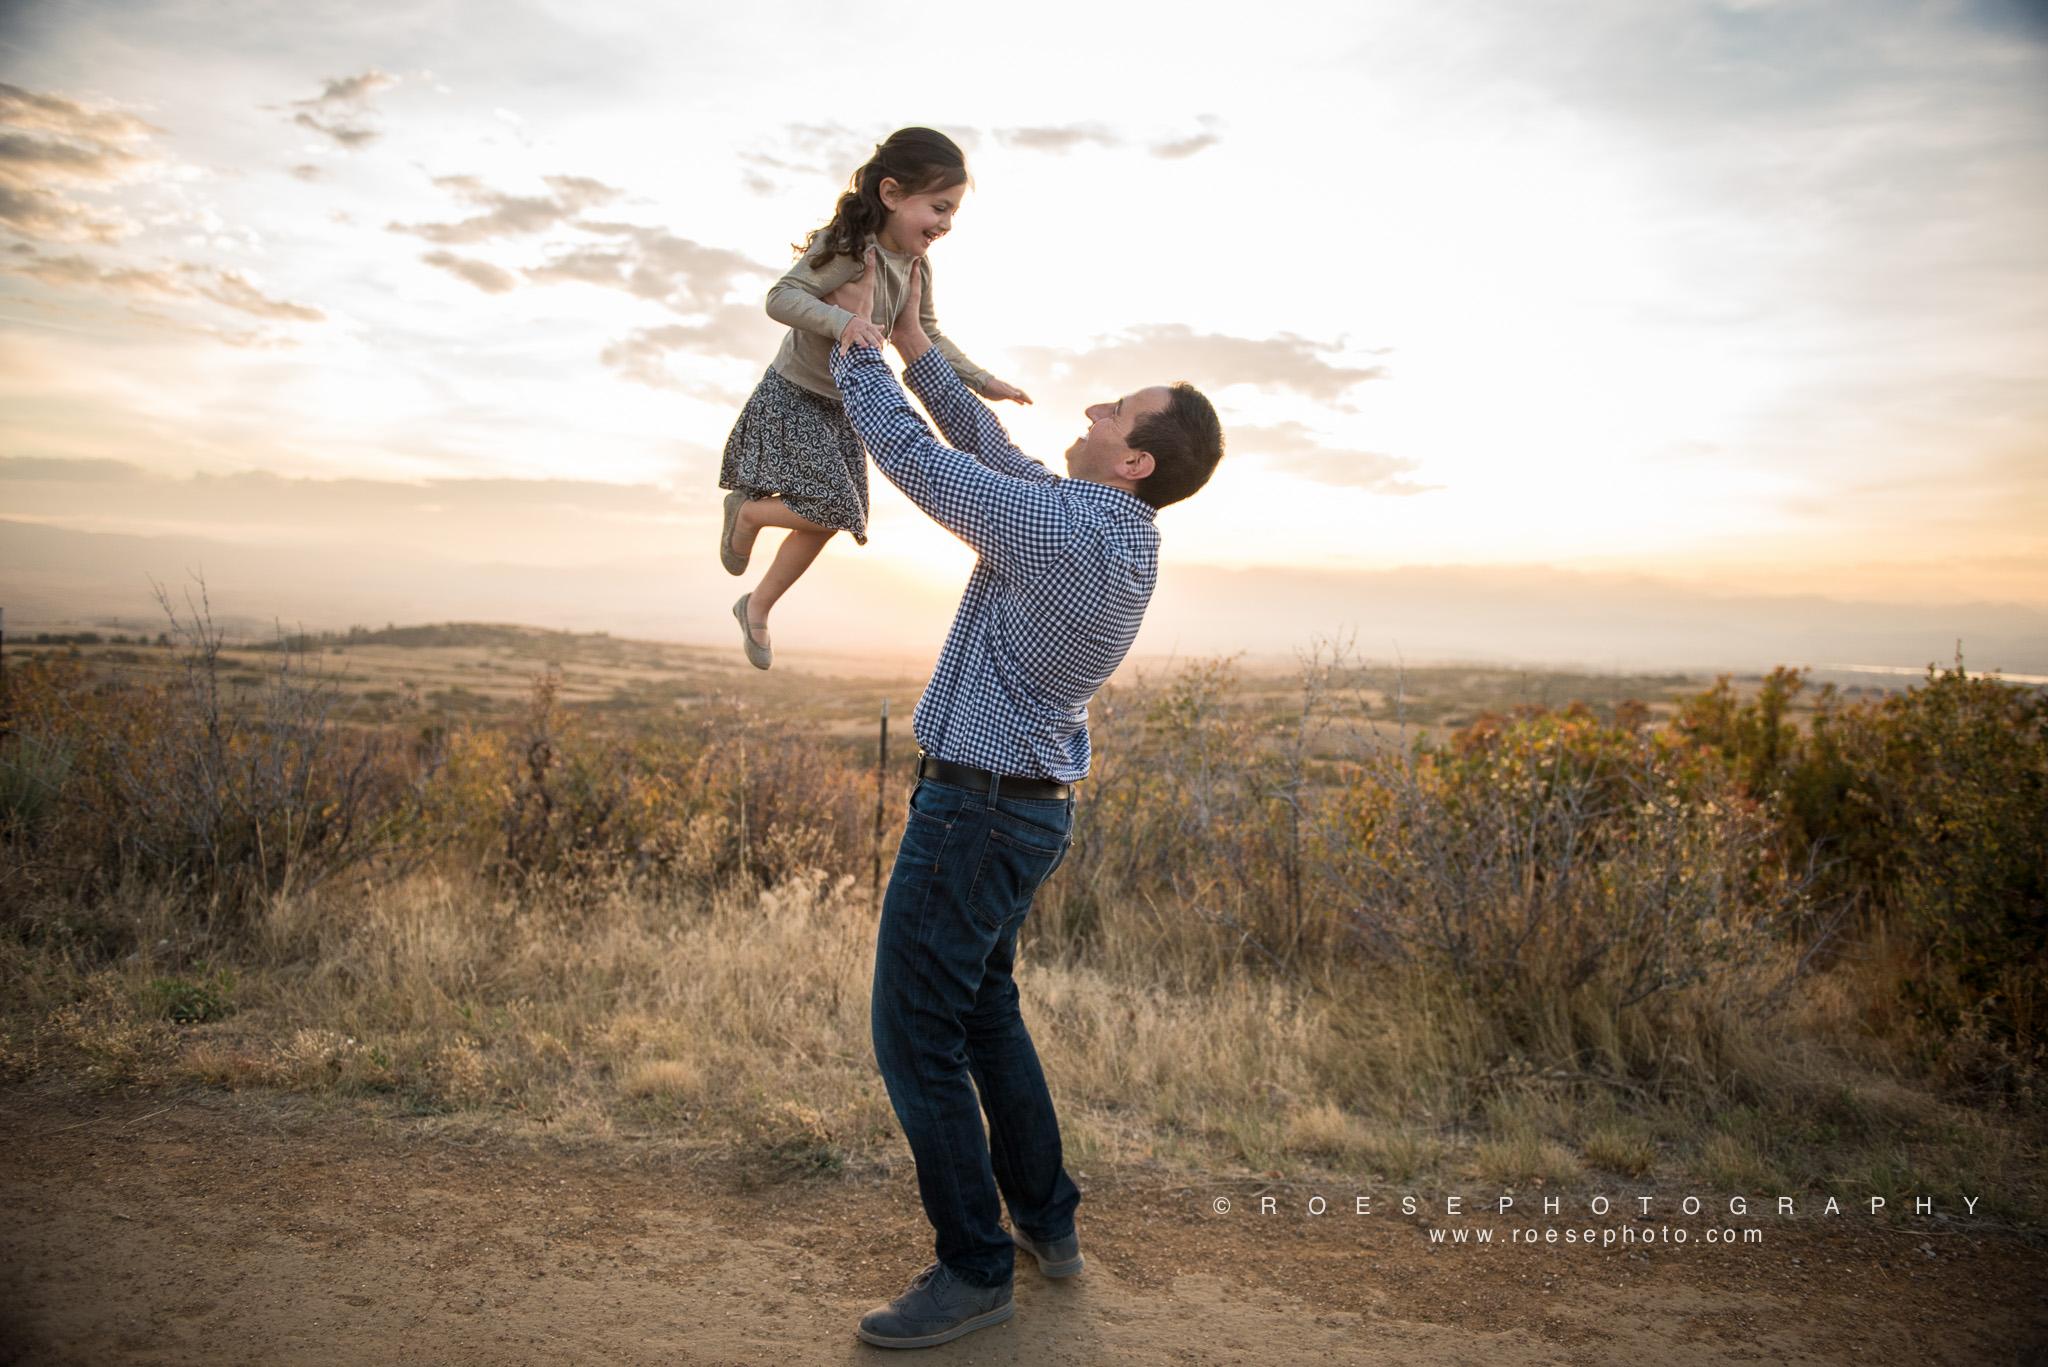 C.-Roese-Ramp-Roese-Photography-LLC.-Bennett-Family-20.jpg